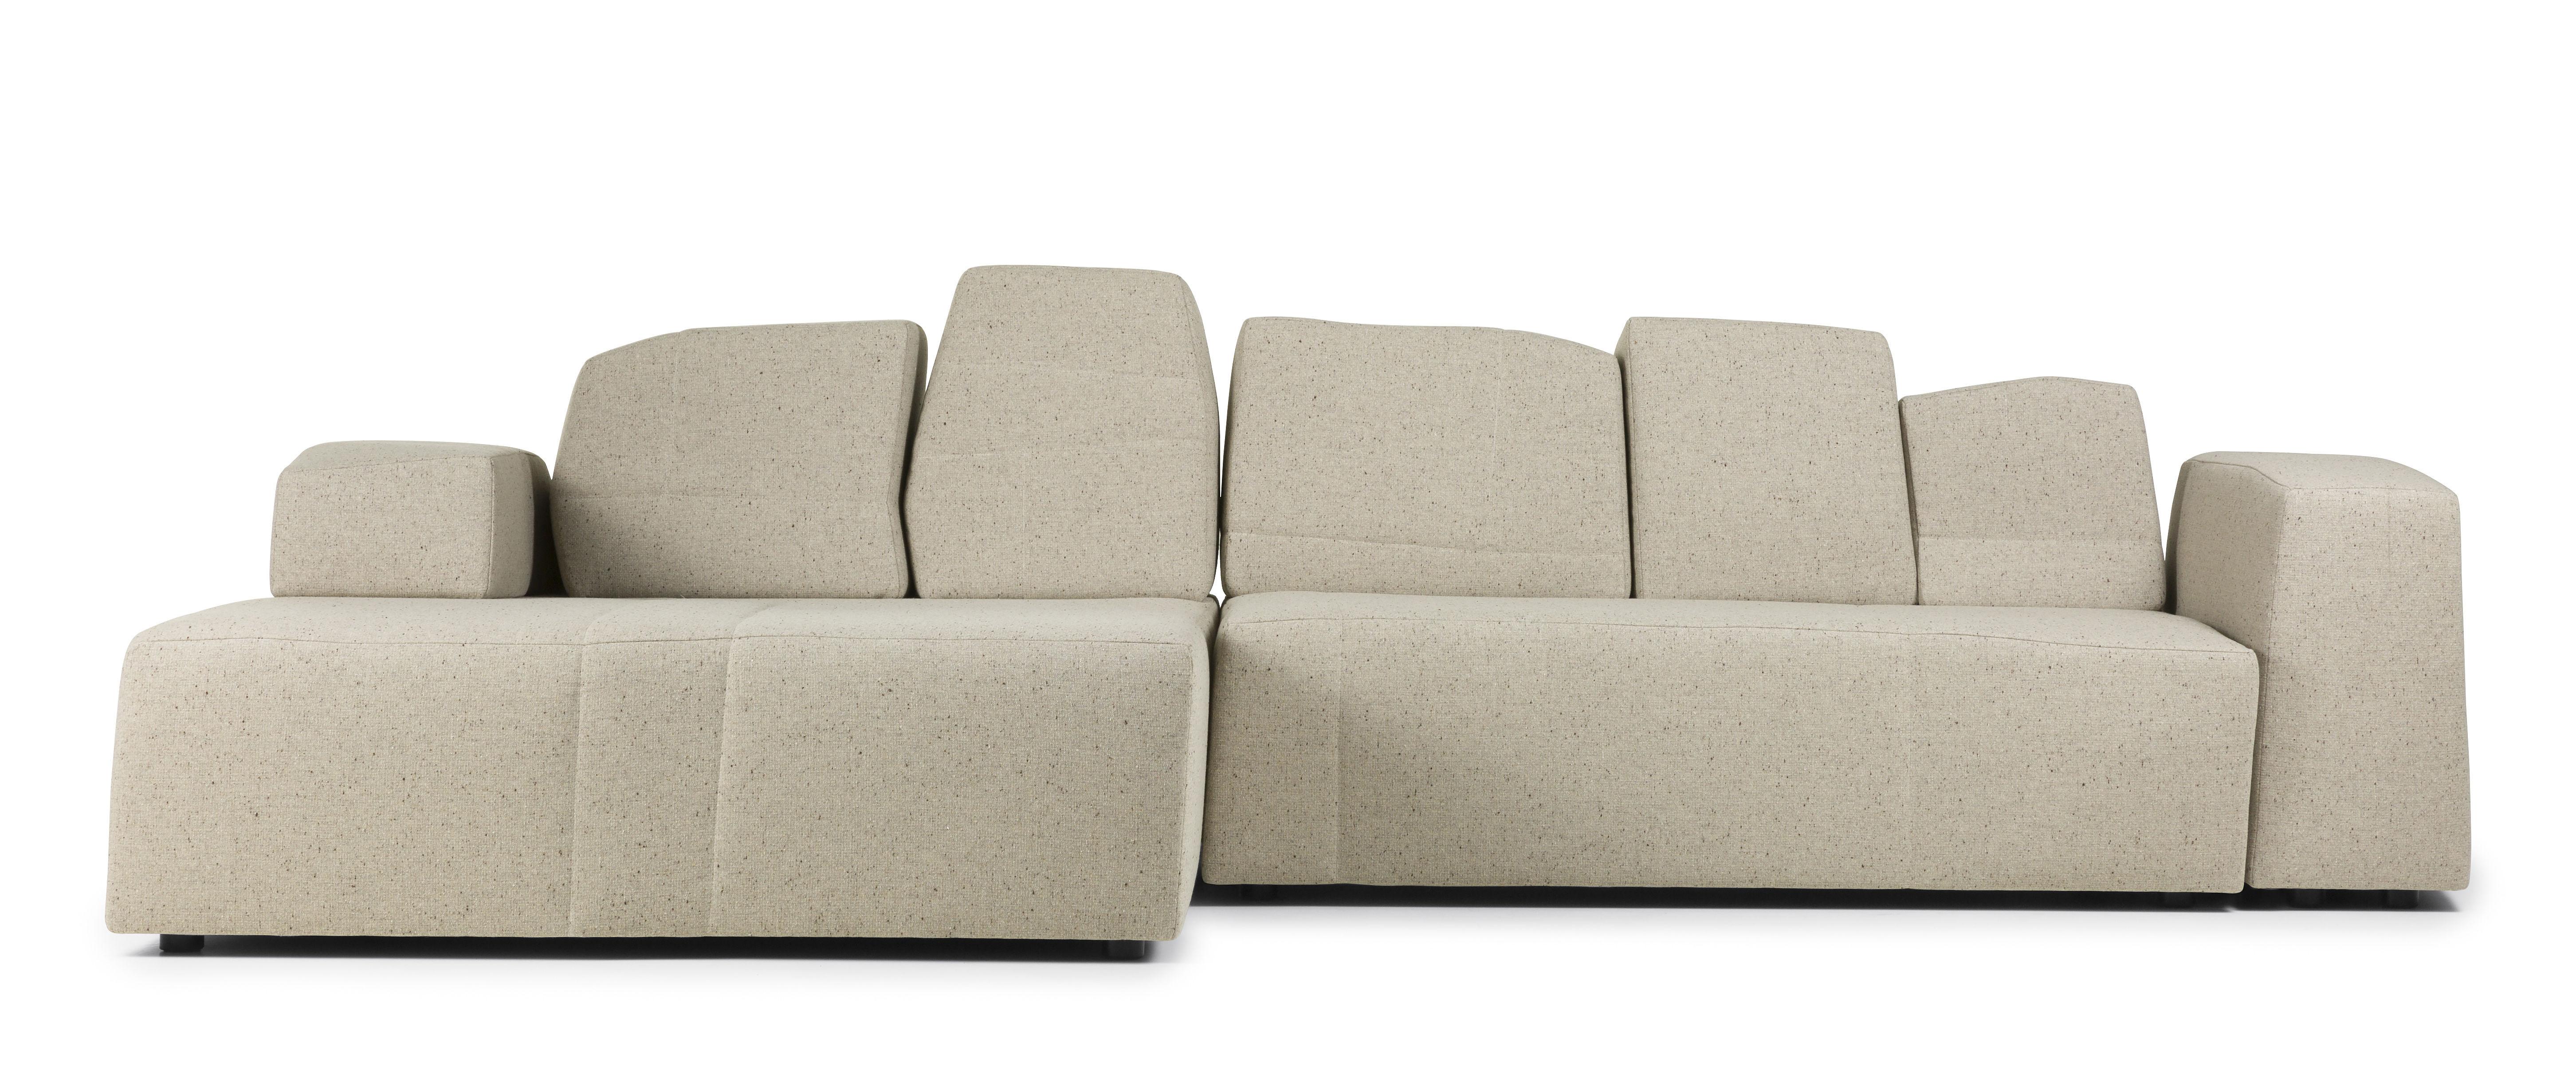 Furniture - Sofas - Something Like This Modular sofa - 2 units / 3 seats - L 307 cm by Moooi - Marl beige - Fabric - Wood - Foam - Metal